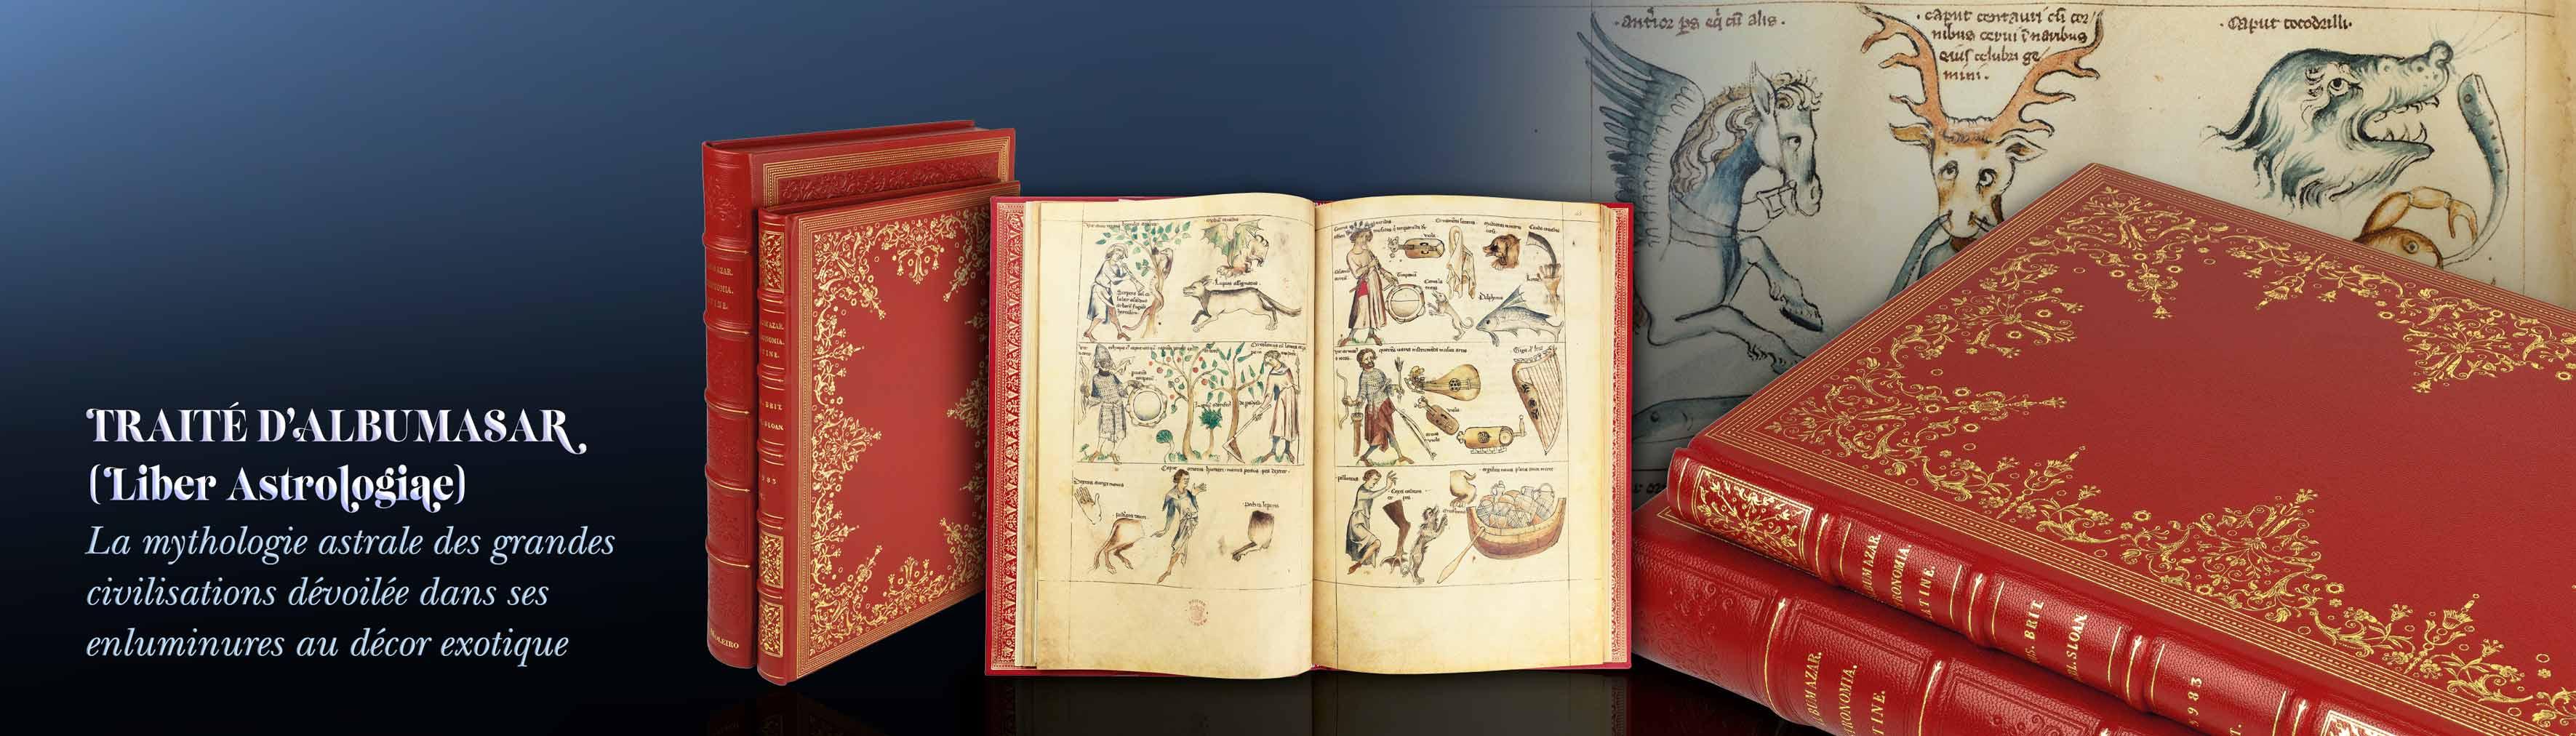 Traité d?Albumasar (Liber astrologiae)